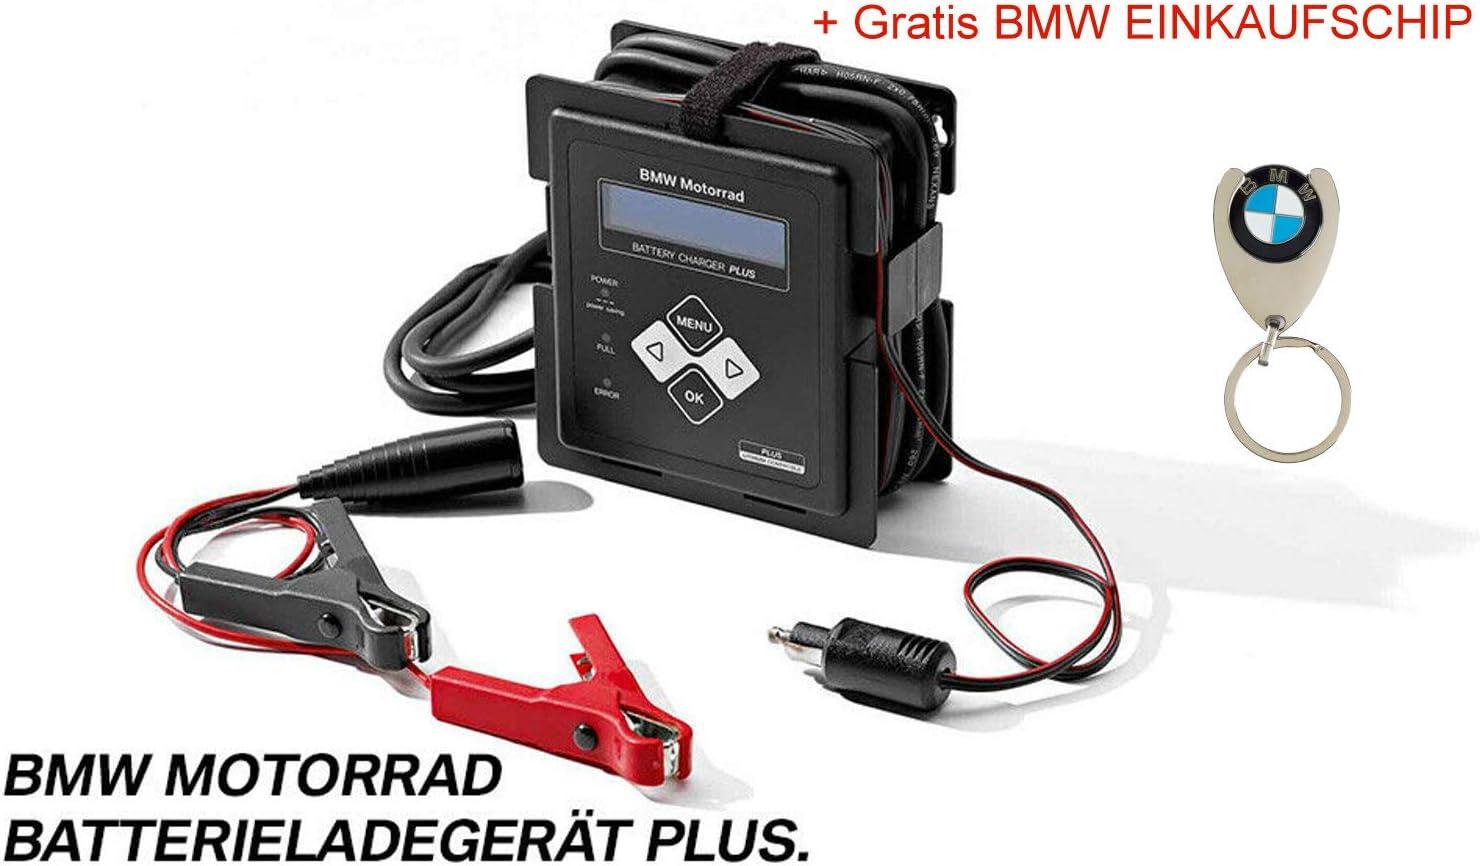 Original Bmw Motorrad Batterieladegerät Plus 77022470950 Auto